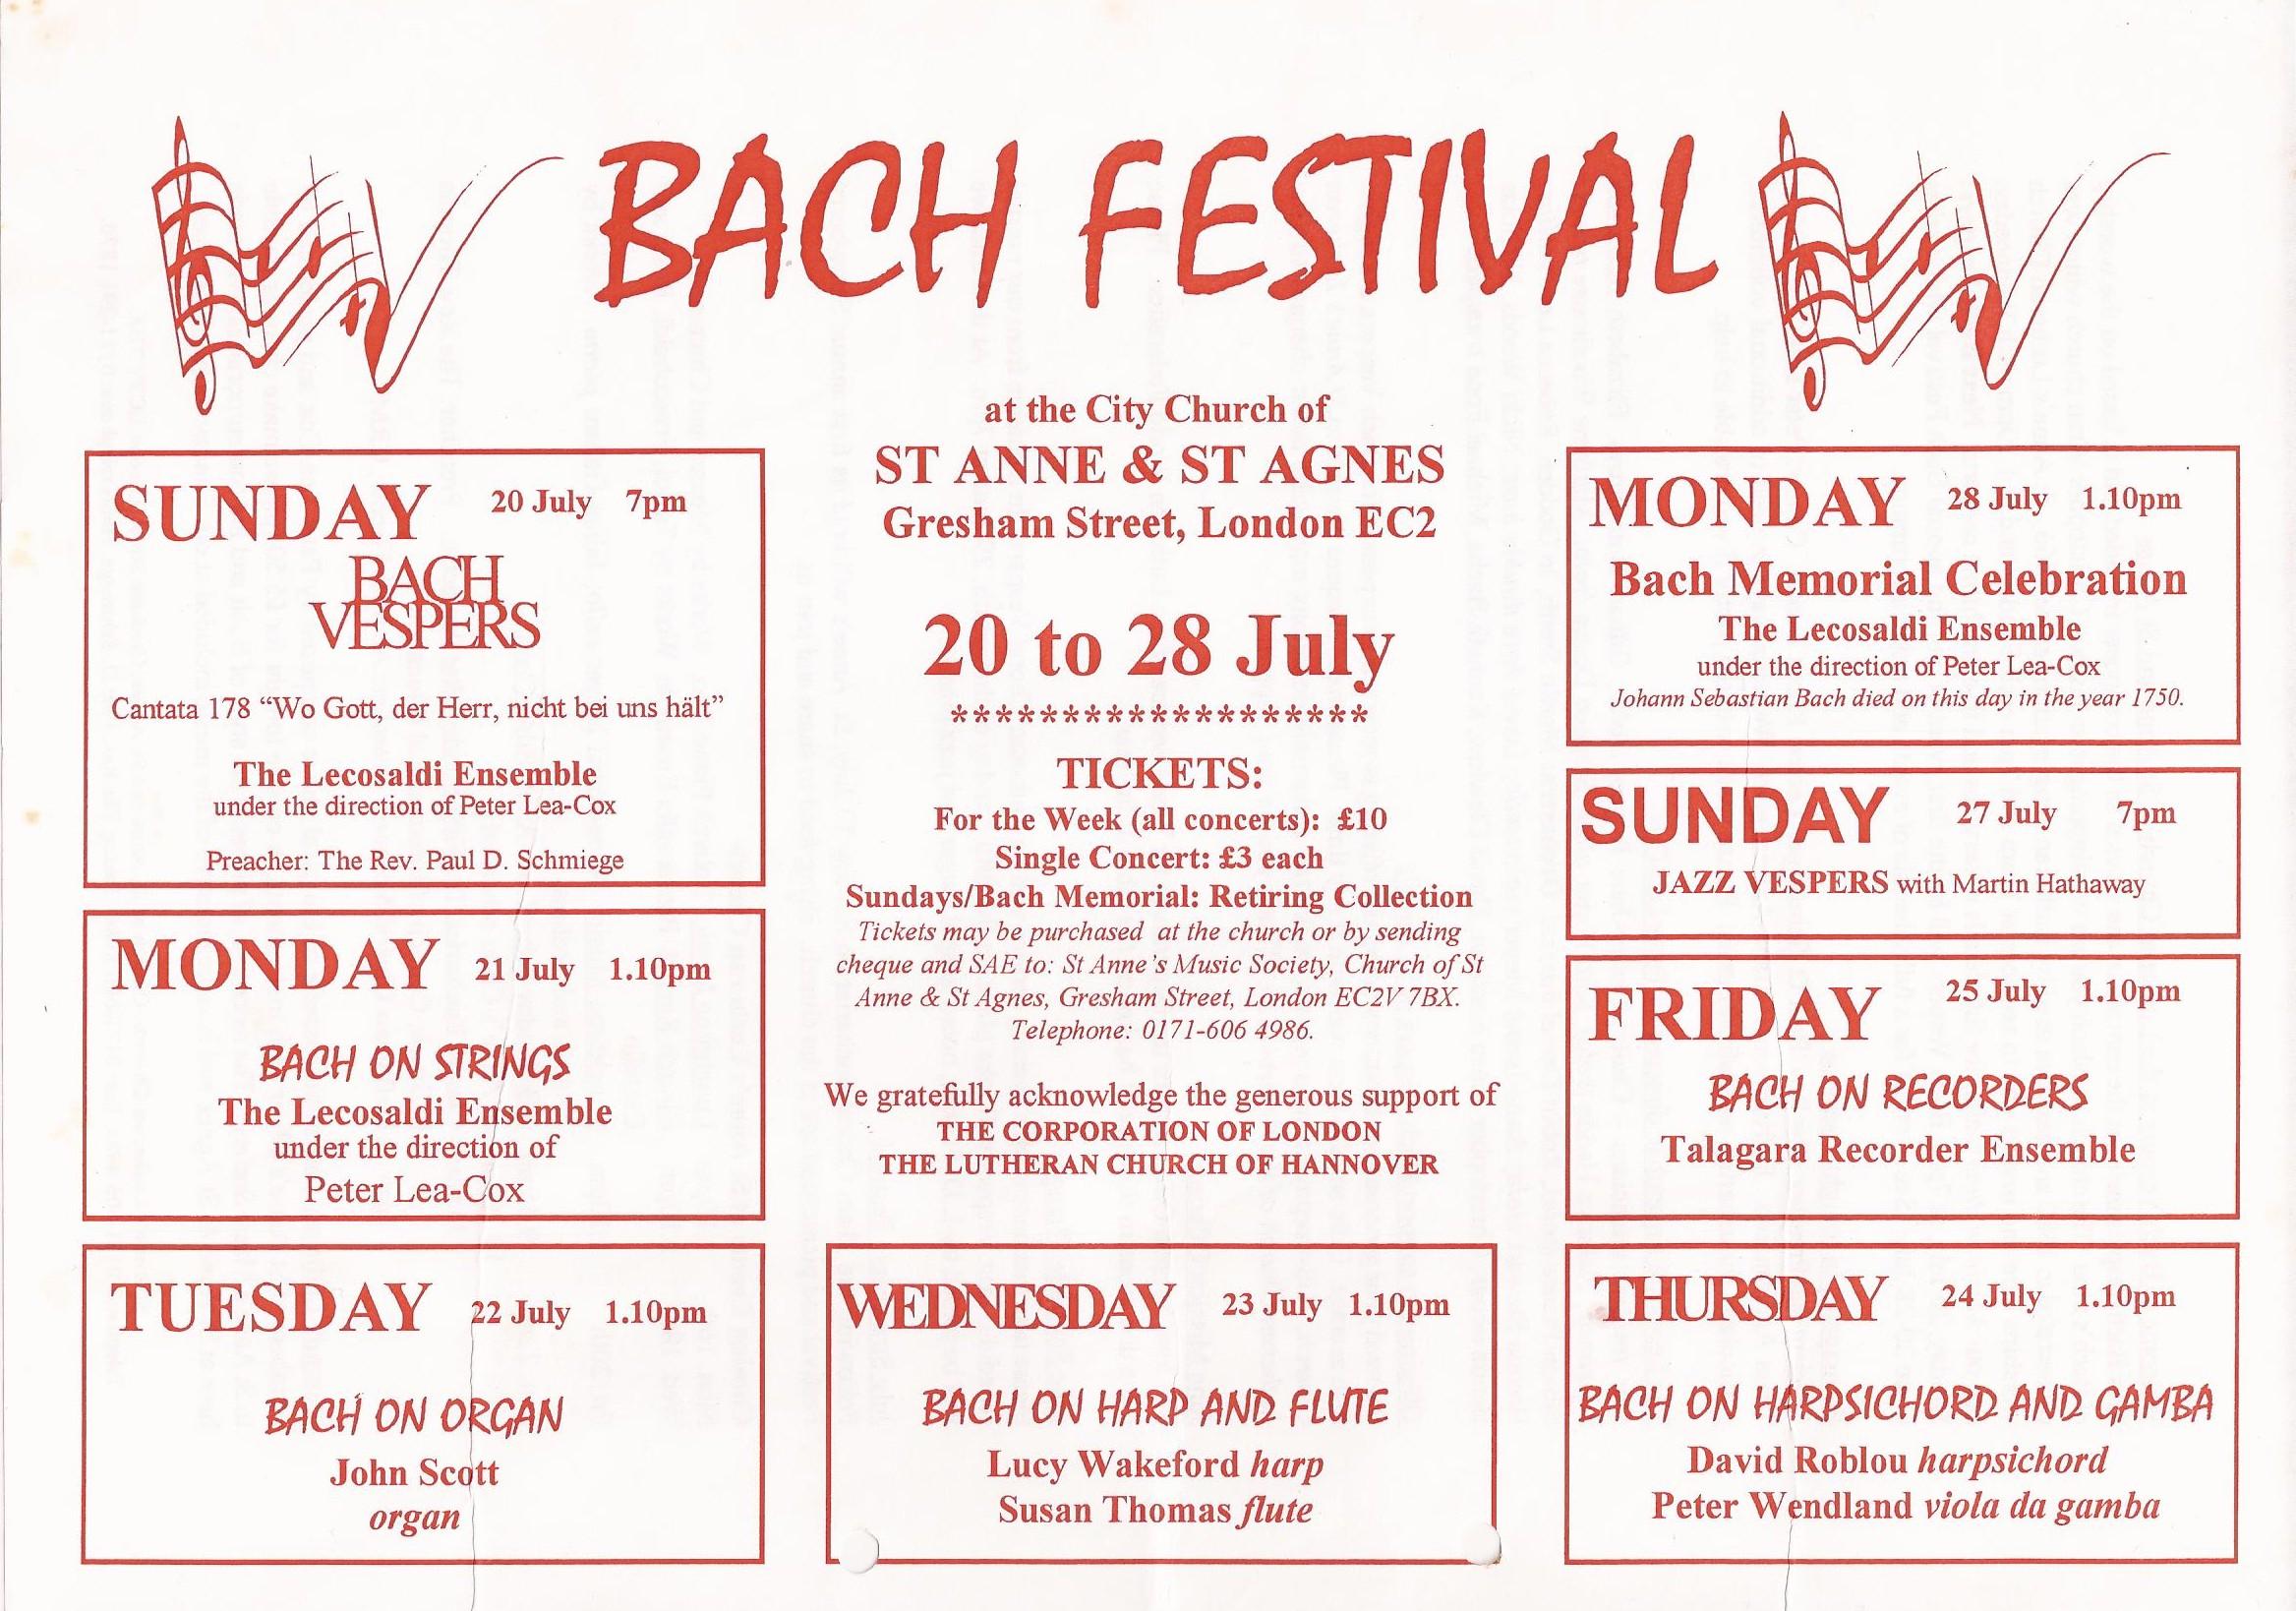 bach-festival-1997